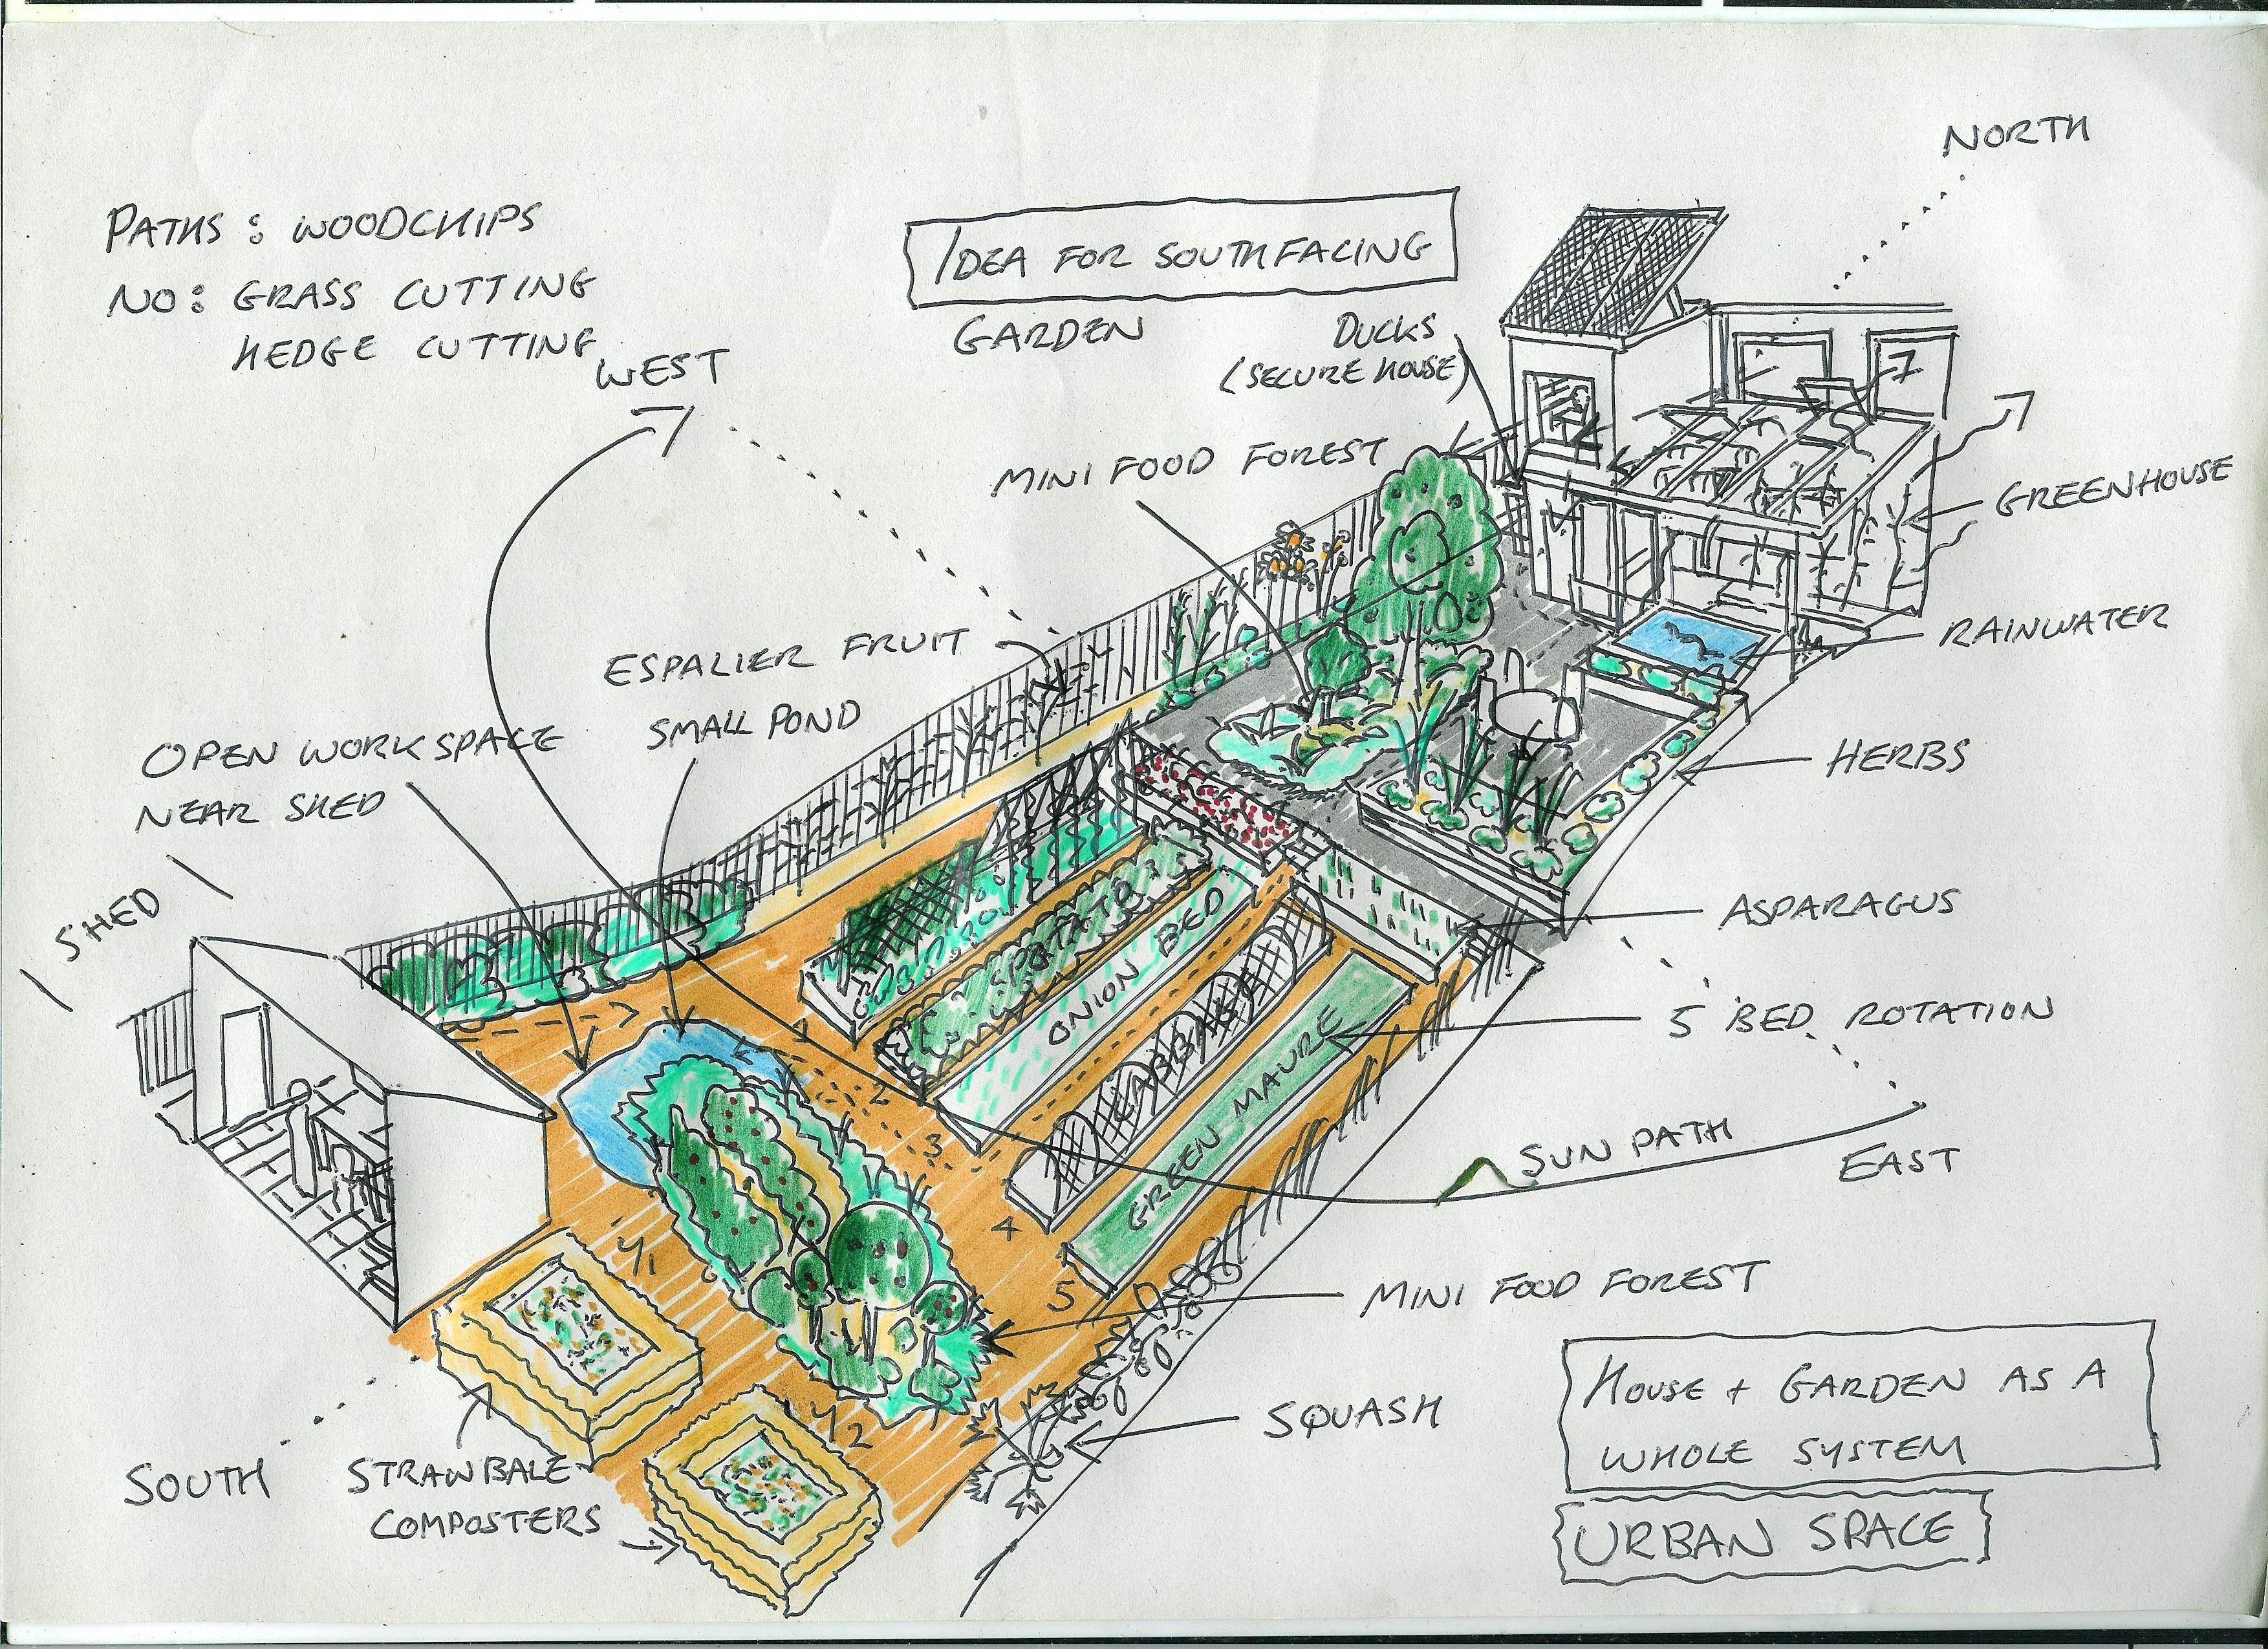 Garden design 30/07/14 | Gardening & Permaculture Design